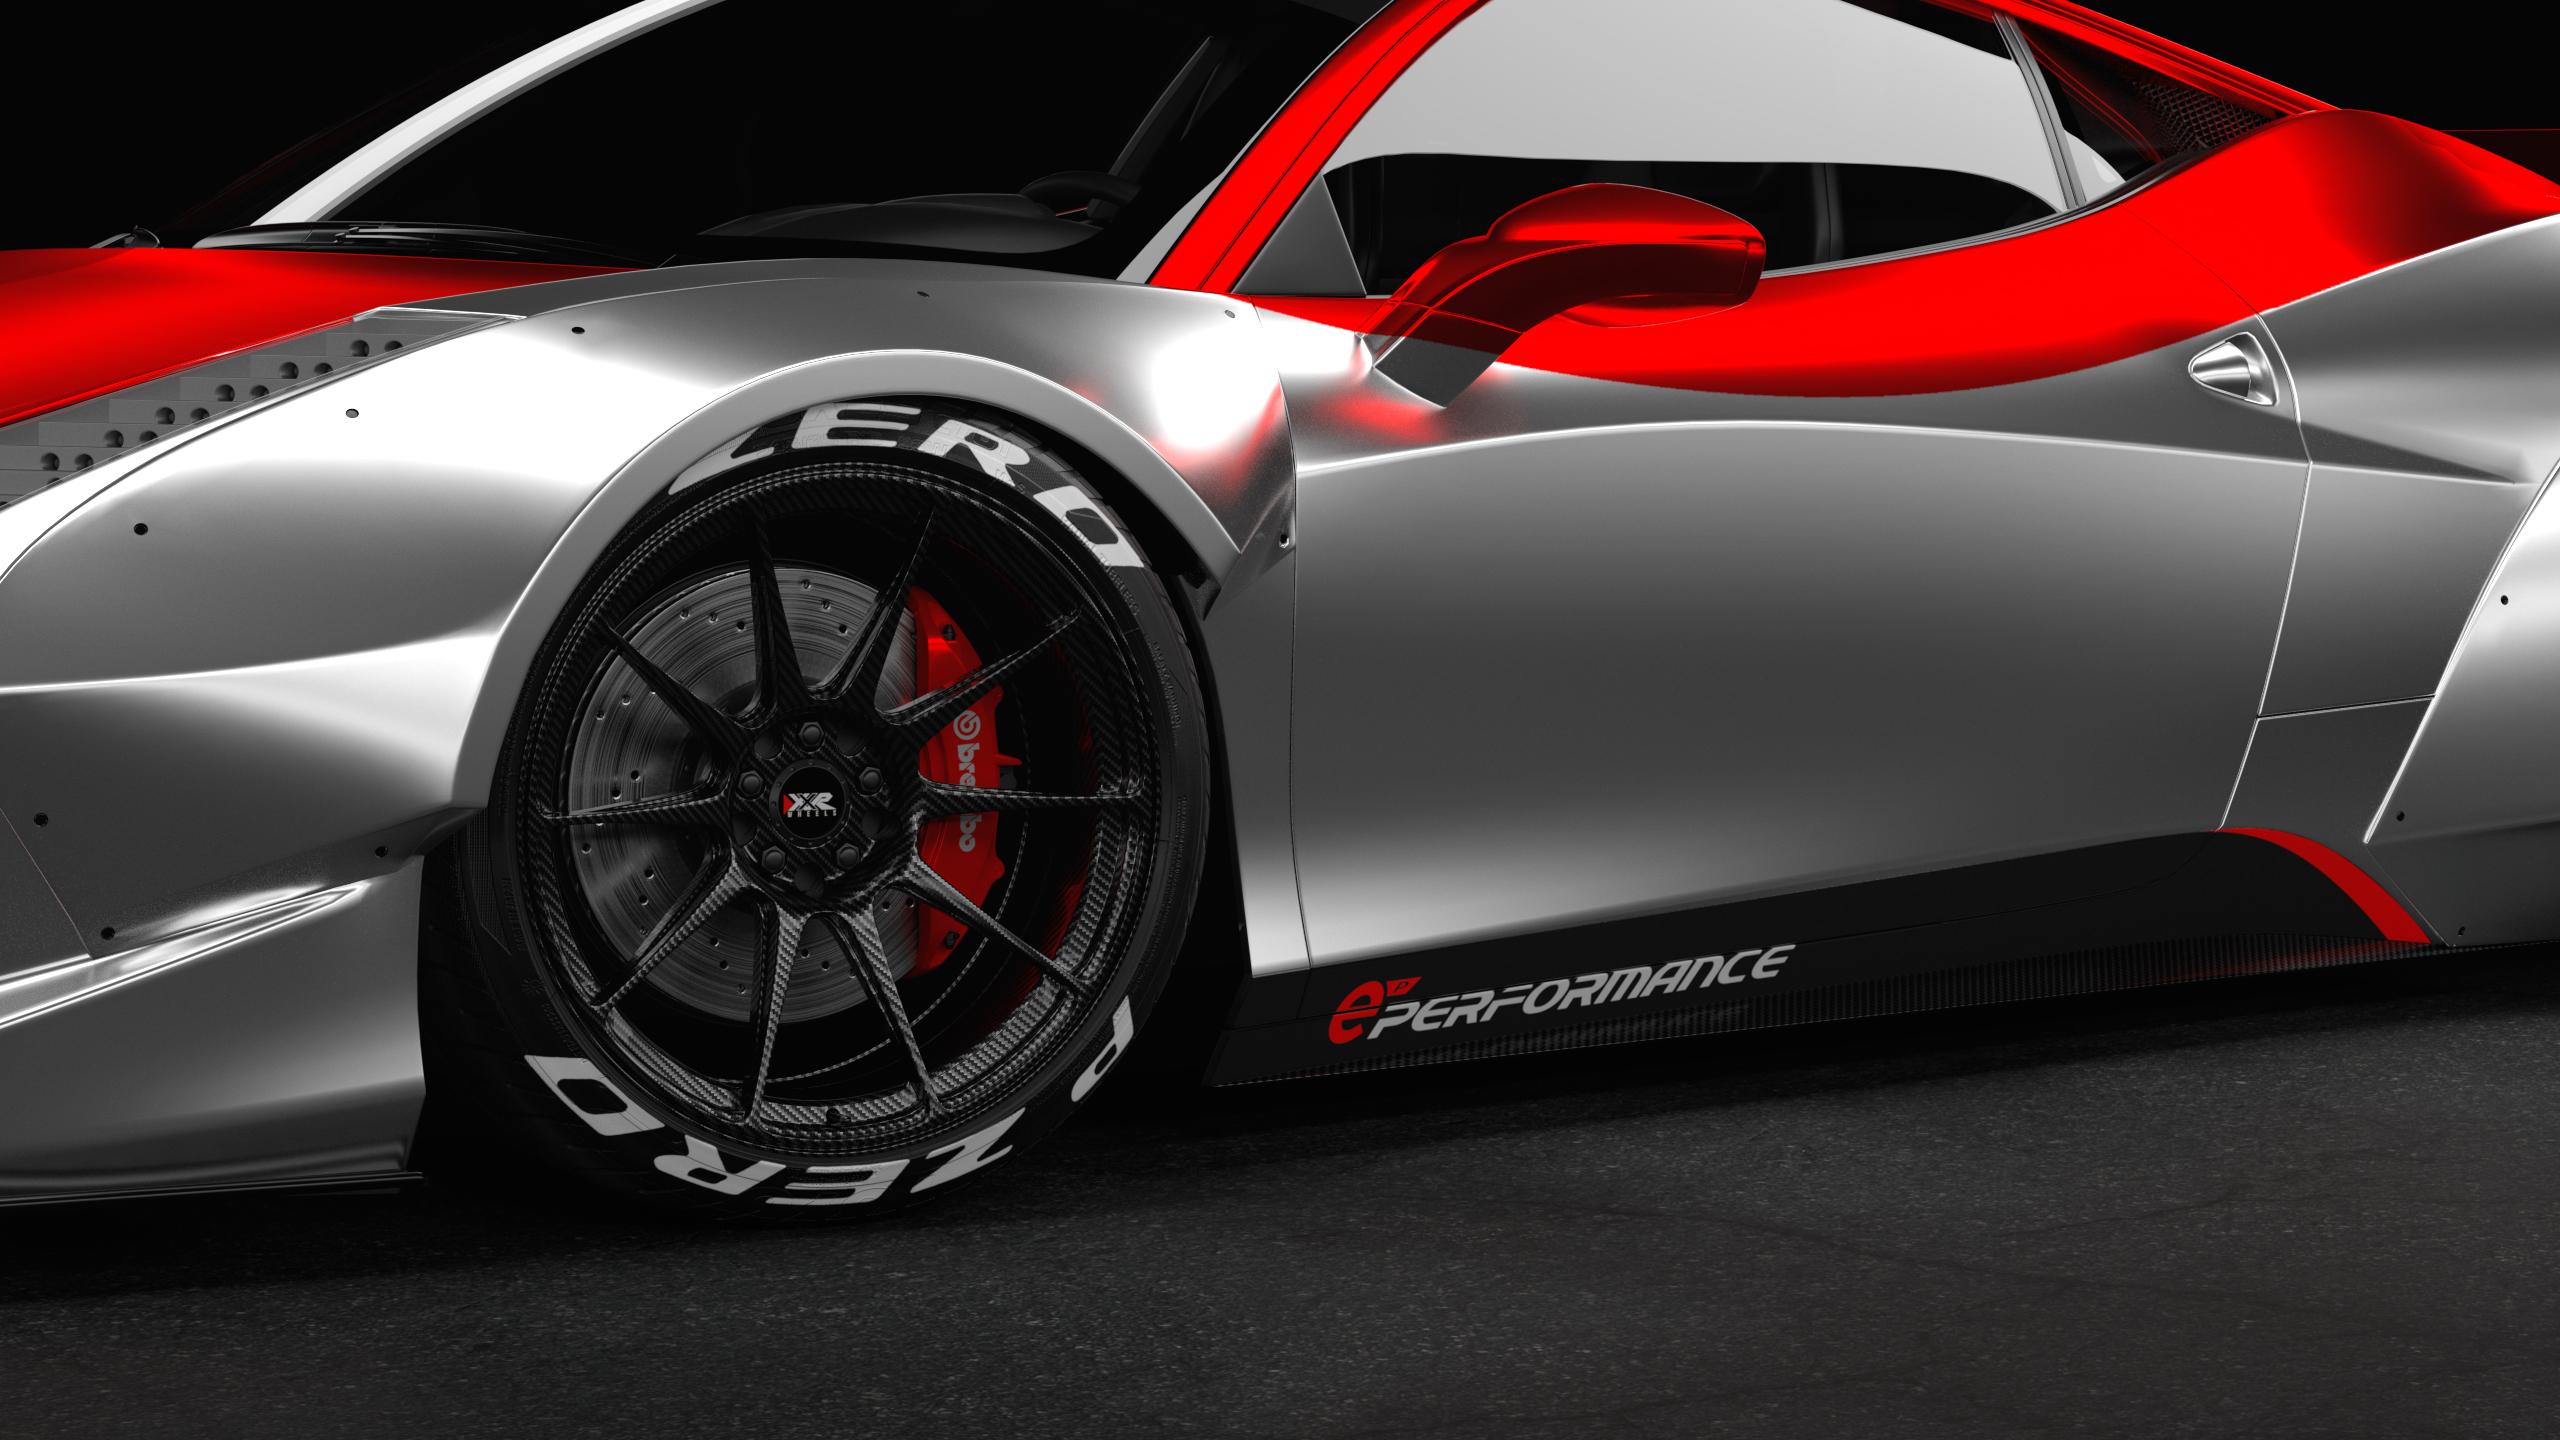 Best Liberty Walk Ferrari 458 Wrap Design By Essellegi Performance